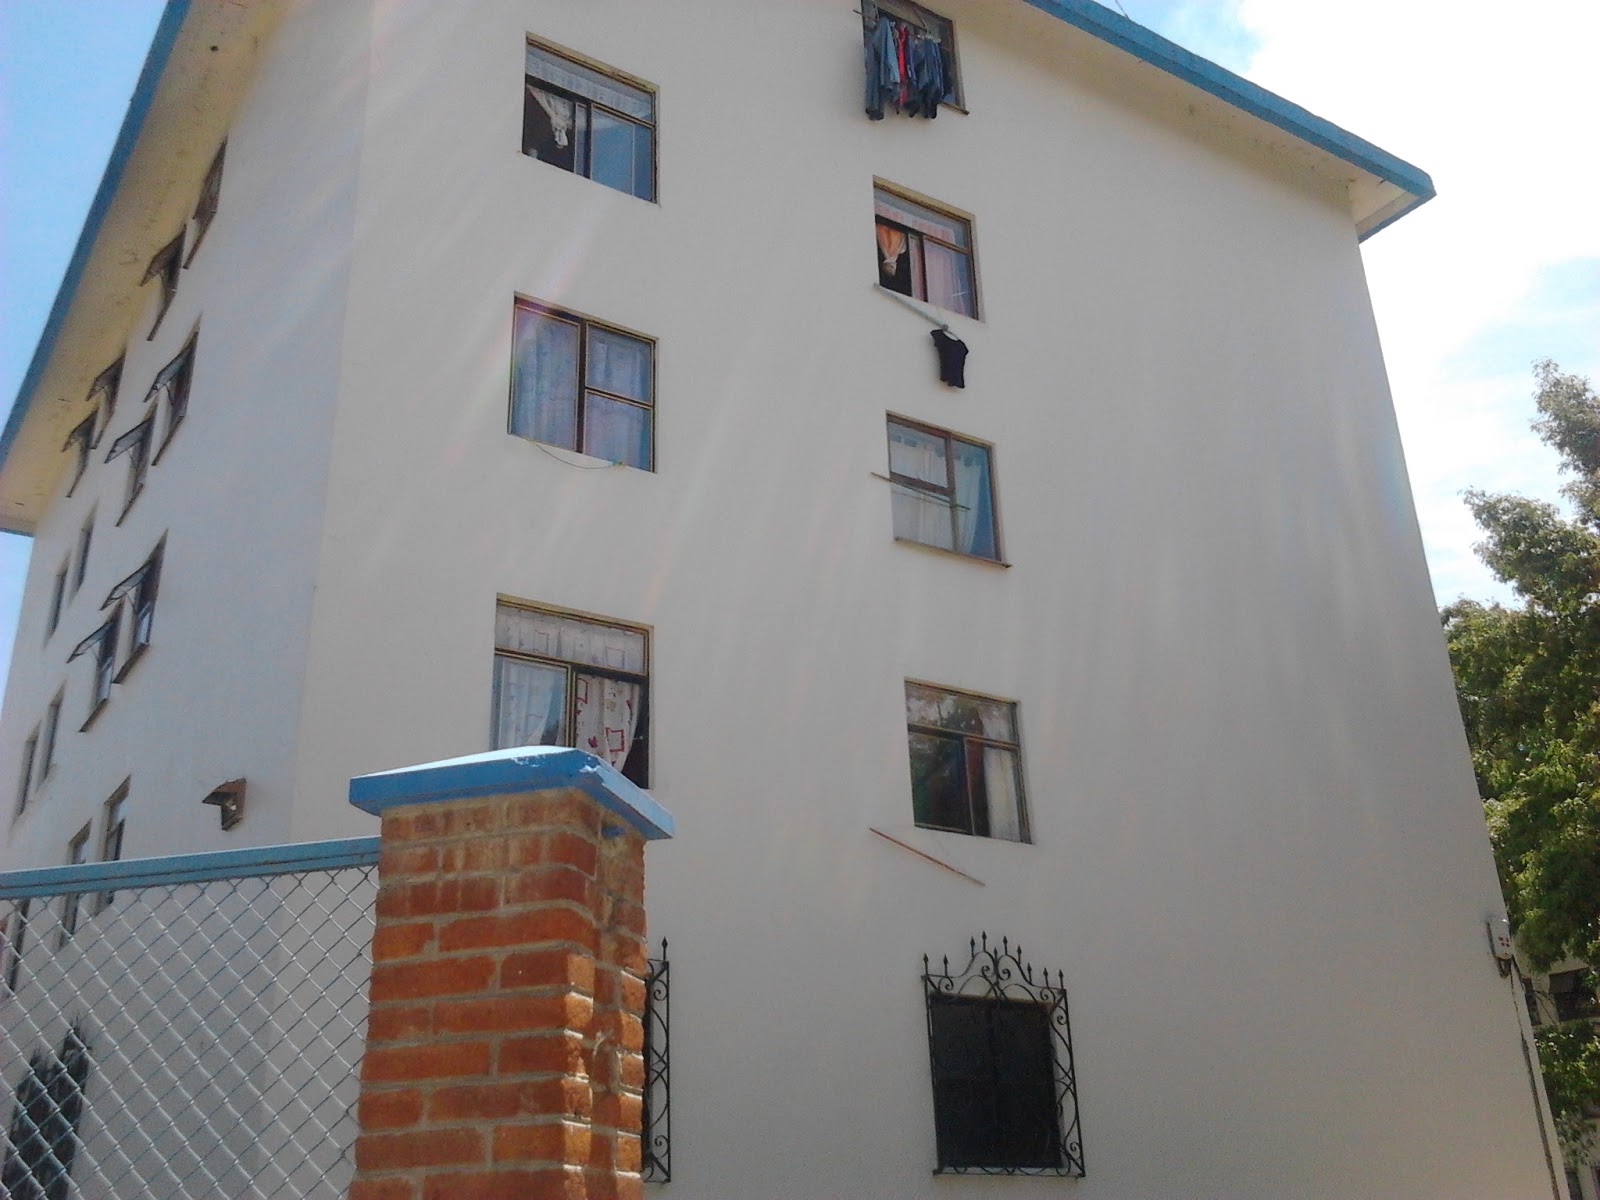 Mentira mundial universidad aut noma chapingo for Dormitorios de universidades